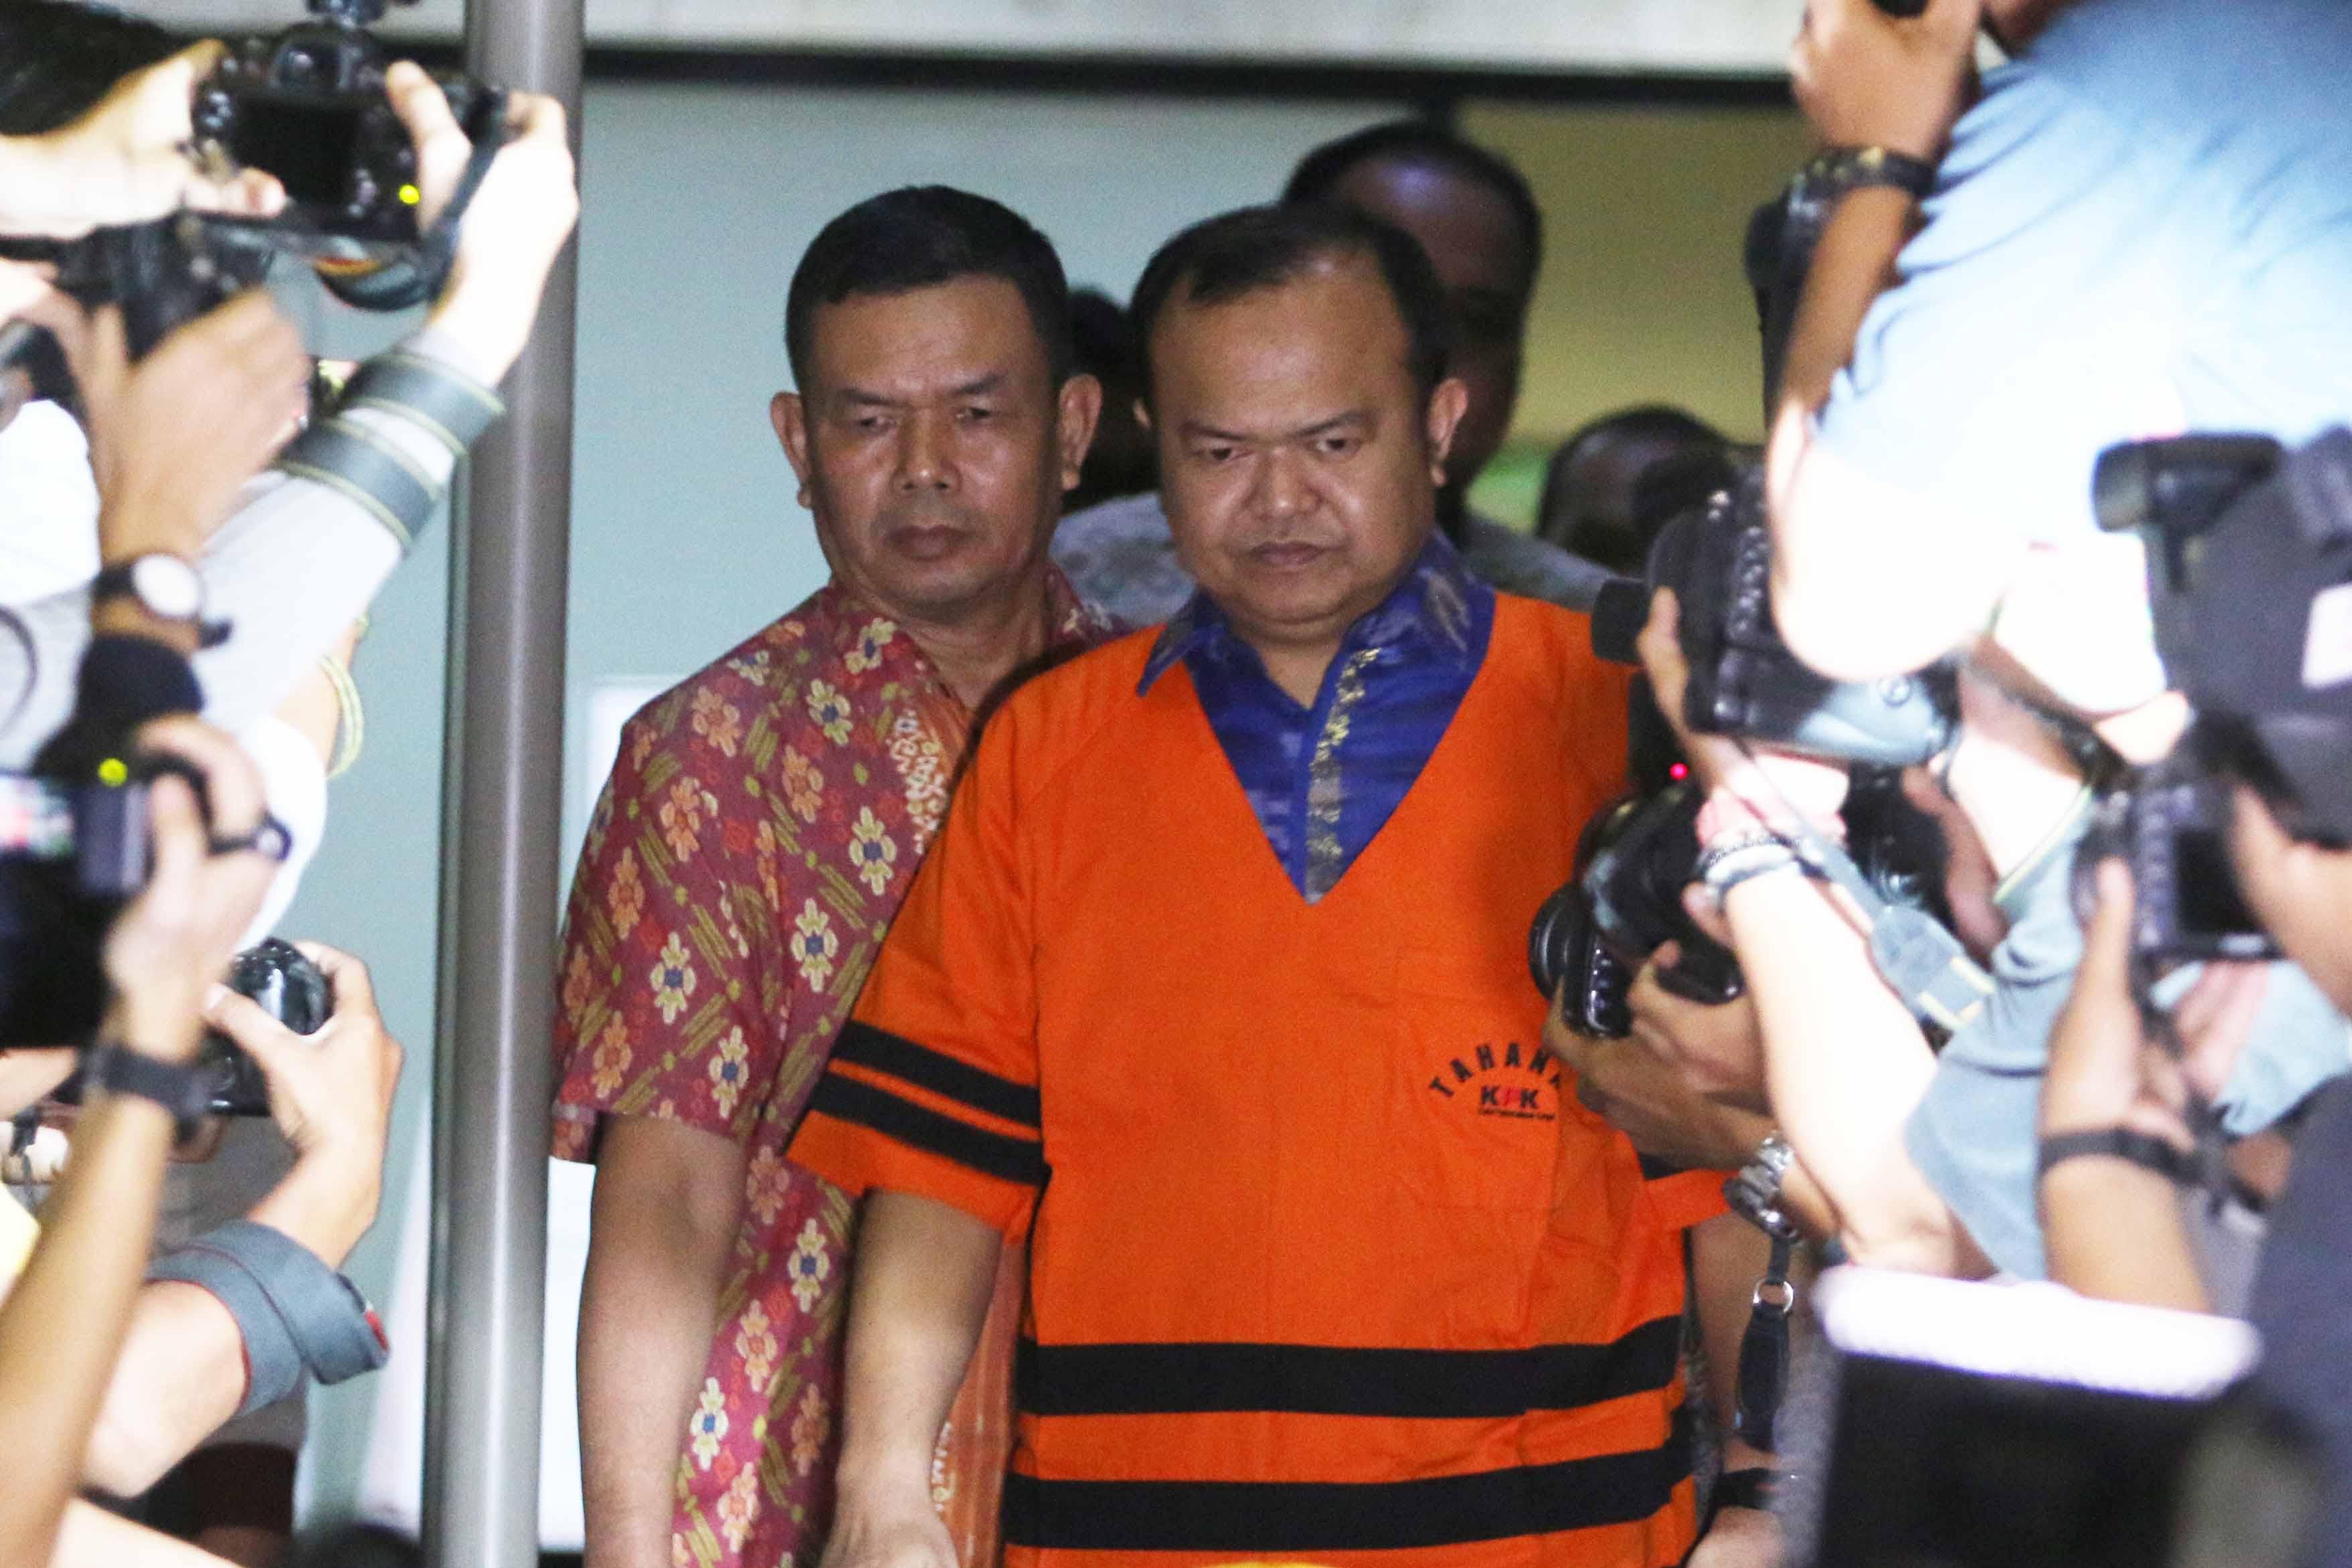 DITAHAN. Tersangka kasus dugaan suap Patrice Rio Capella mengenakan rompi tahanan Komisi Pemberantasan Korupsi, Jumat, 23 Oktober.